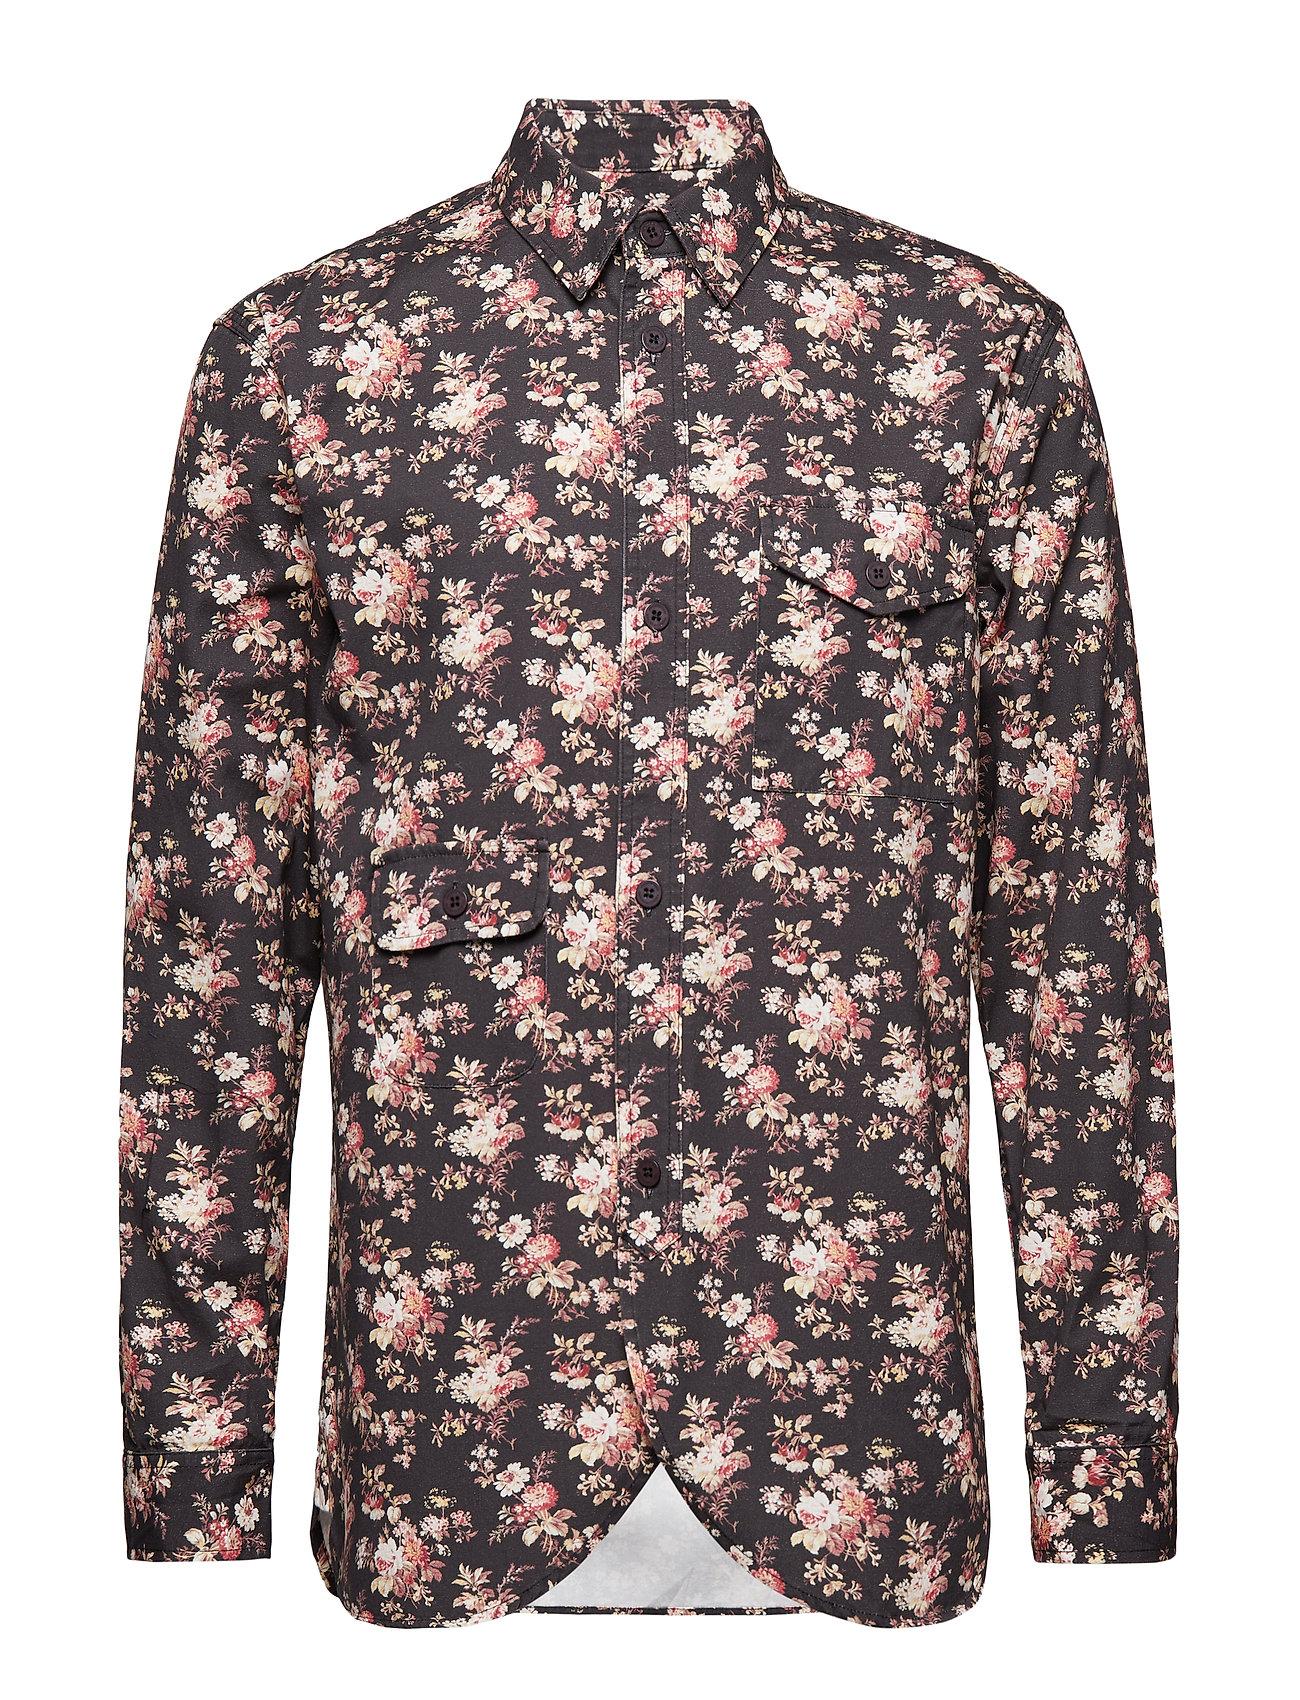 HAN Kjøbenhavn Army Shirt - FLOWER CANVAS